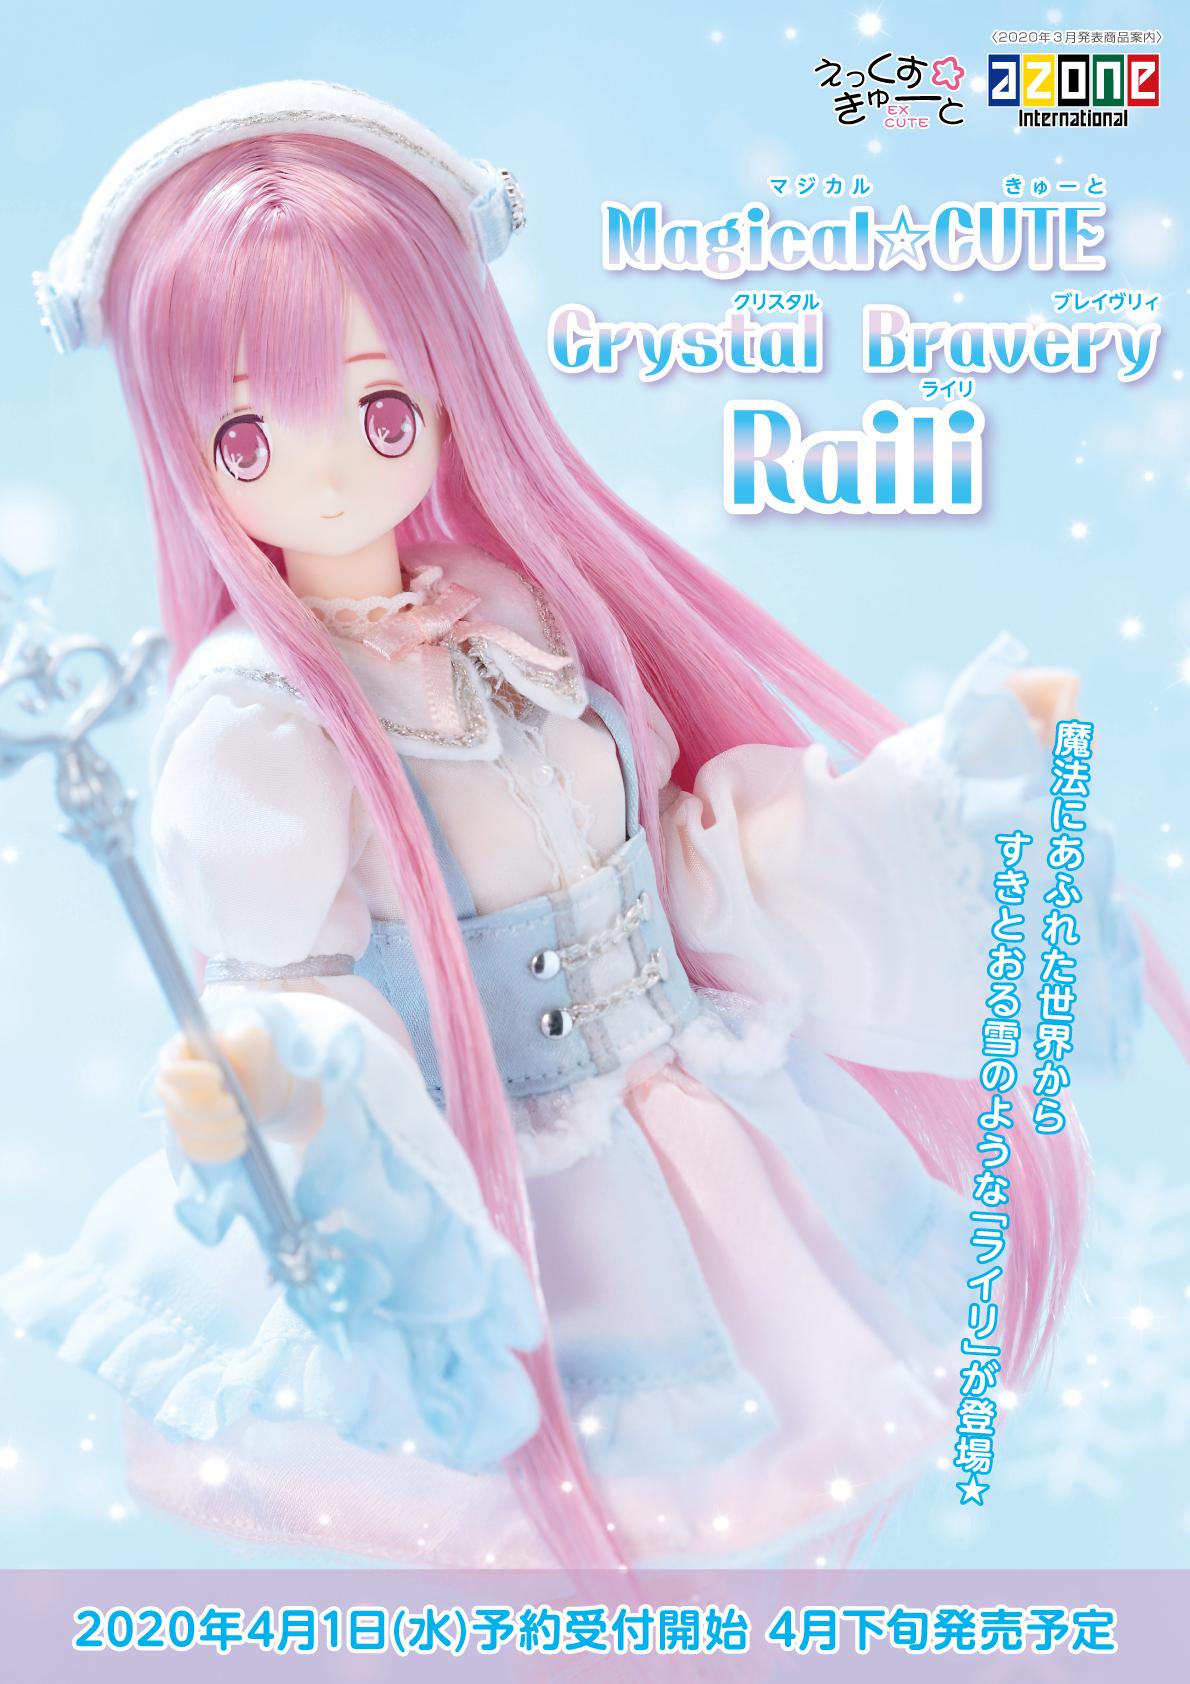 Magical☆CUTE/Crystal Bravery Raili